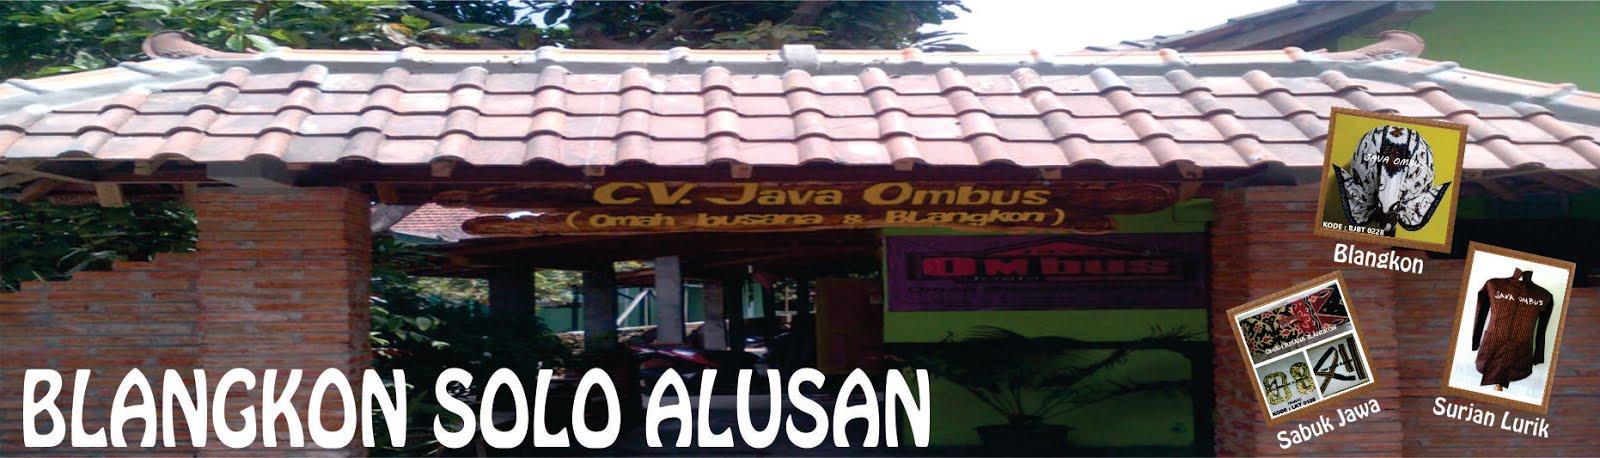 BLANGKON SOLO ALUSAN